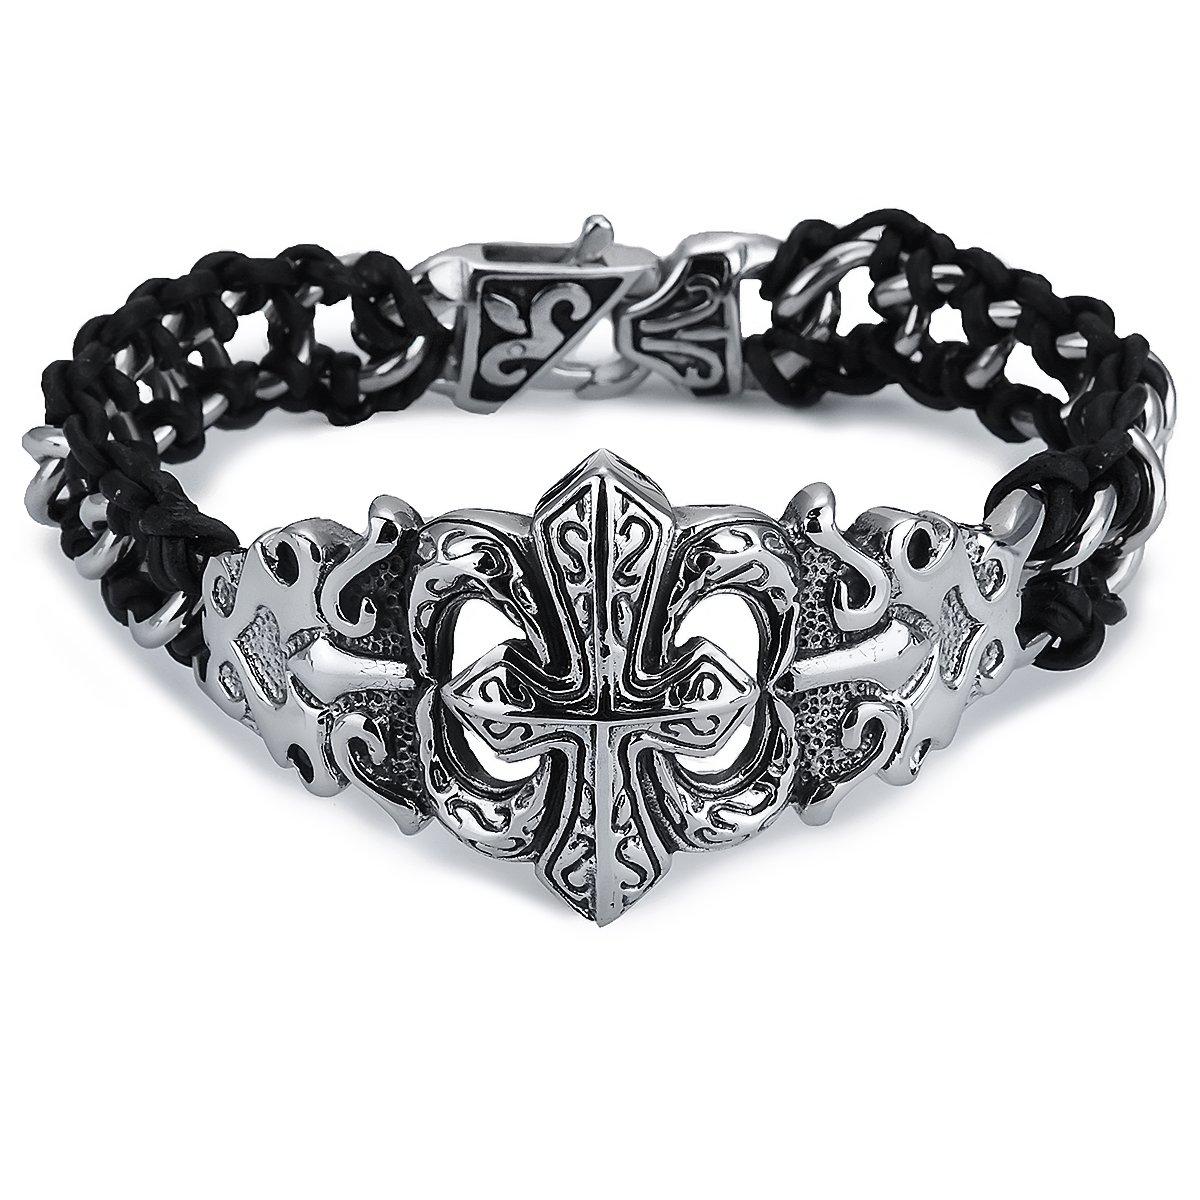 Pulsera de cuero trenzada negro acero inoxidable beads cruz lirio Fleur de Lis Biker